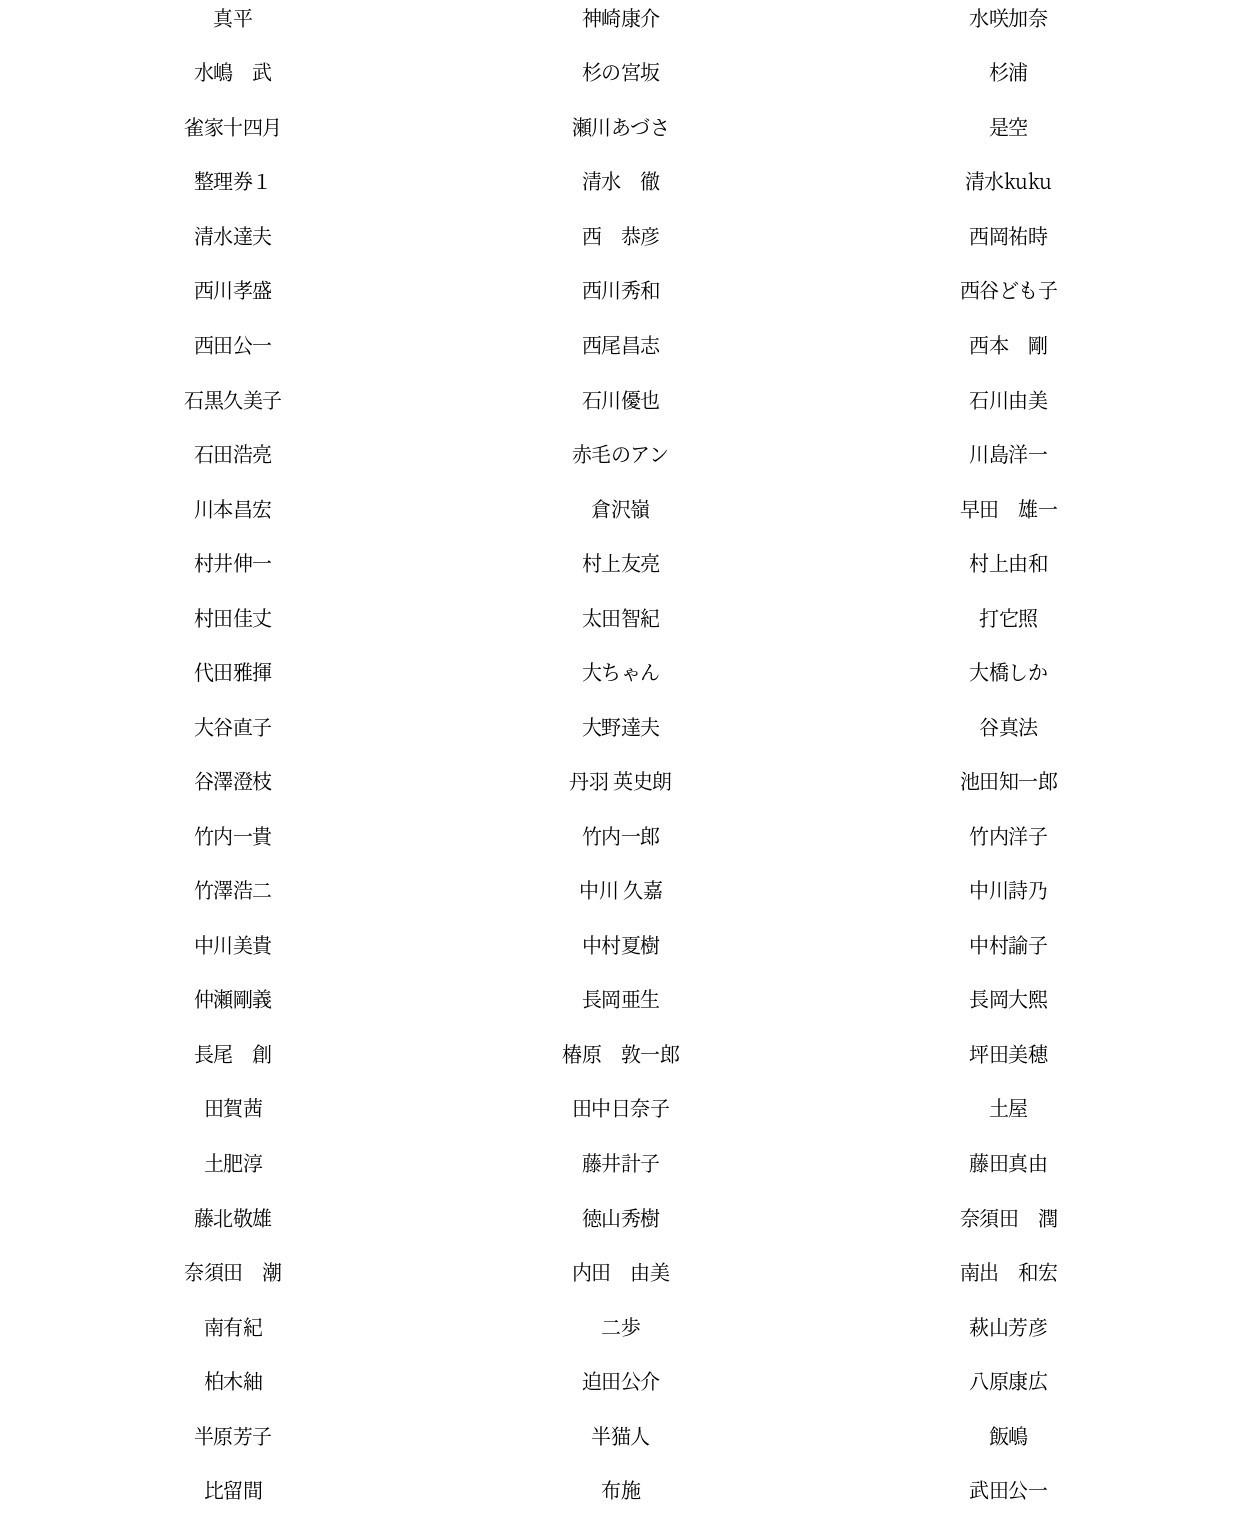 cf-0417-p5.jpg